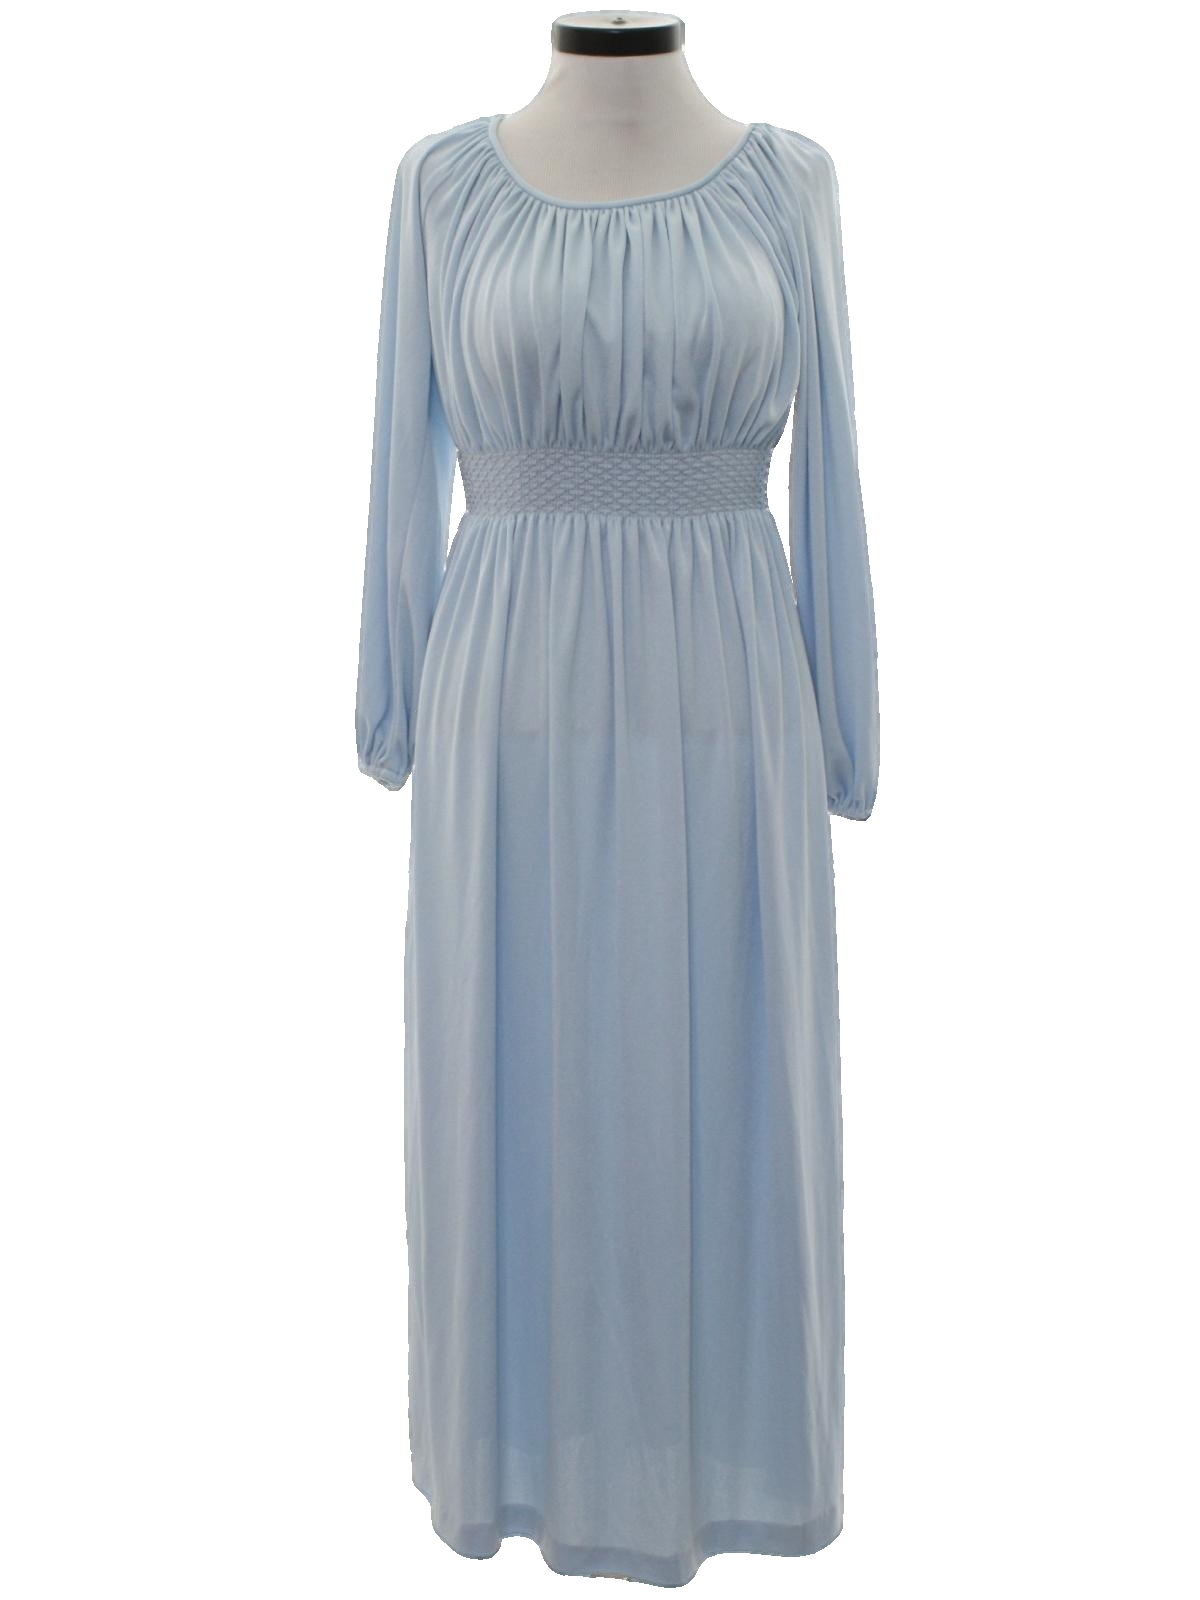 Seventies Vintage Disco Dress: 70s -Party Dress- Womens shiny light ...